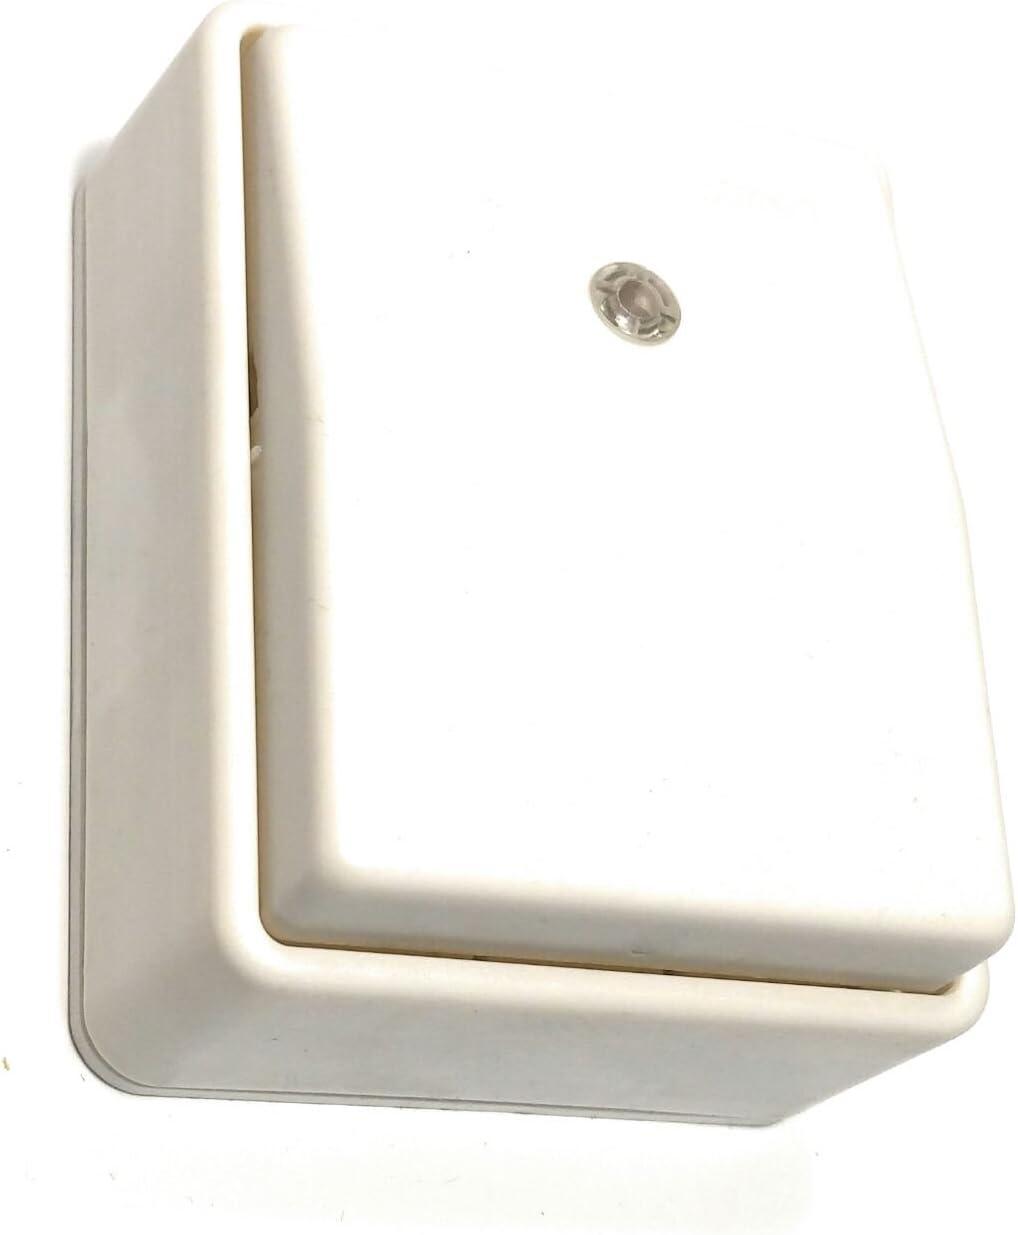 Interruptor Conmutador de Superficie con Luminoso Serie 9 Simon 00904-30 Blanco